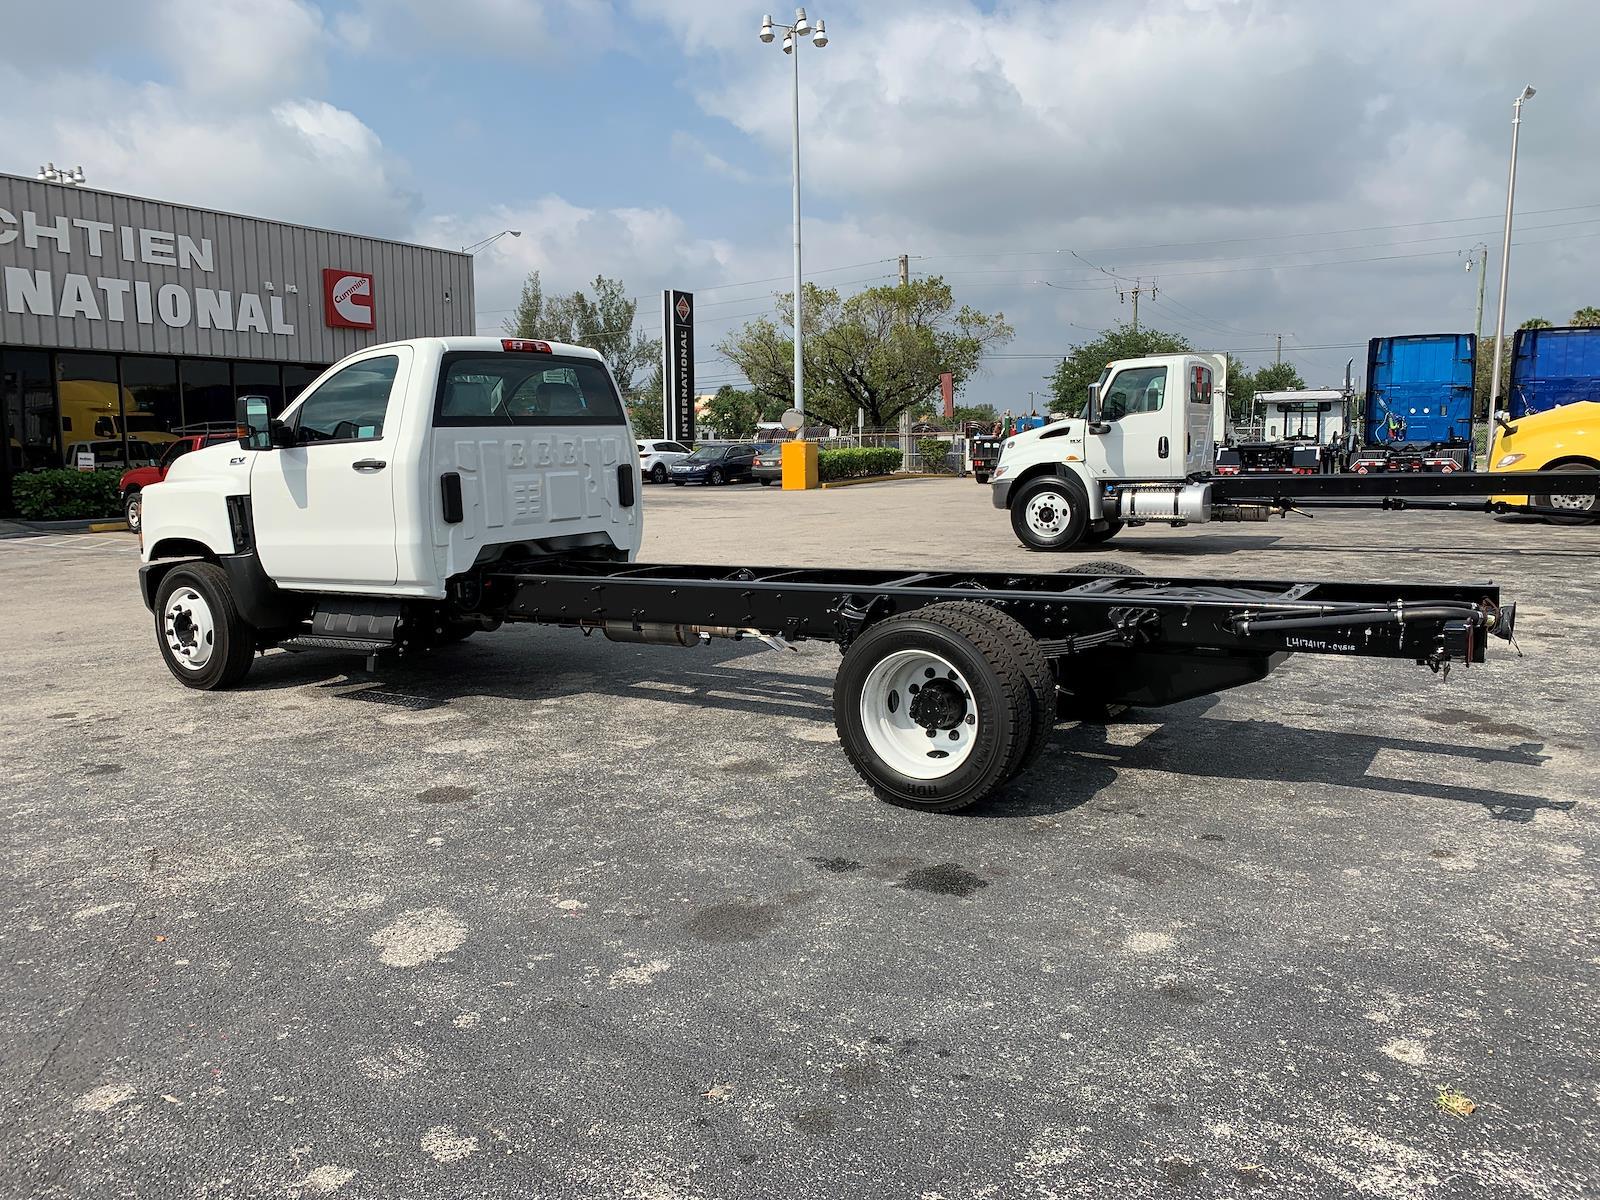 2021 International CV 4x4, Cab Chassis #PR-265948 - photo 1